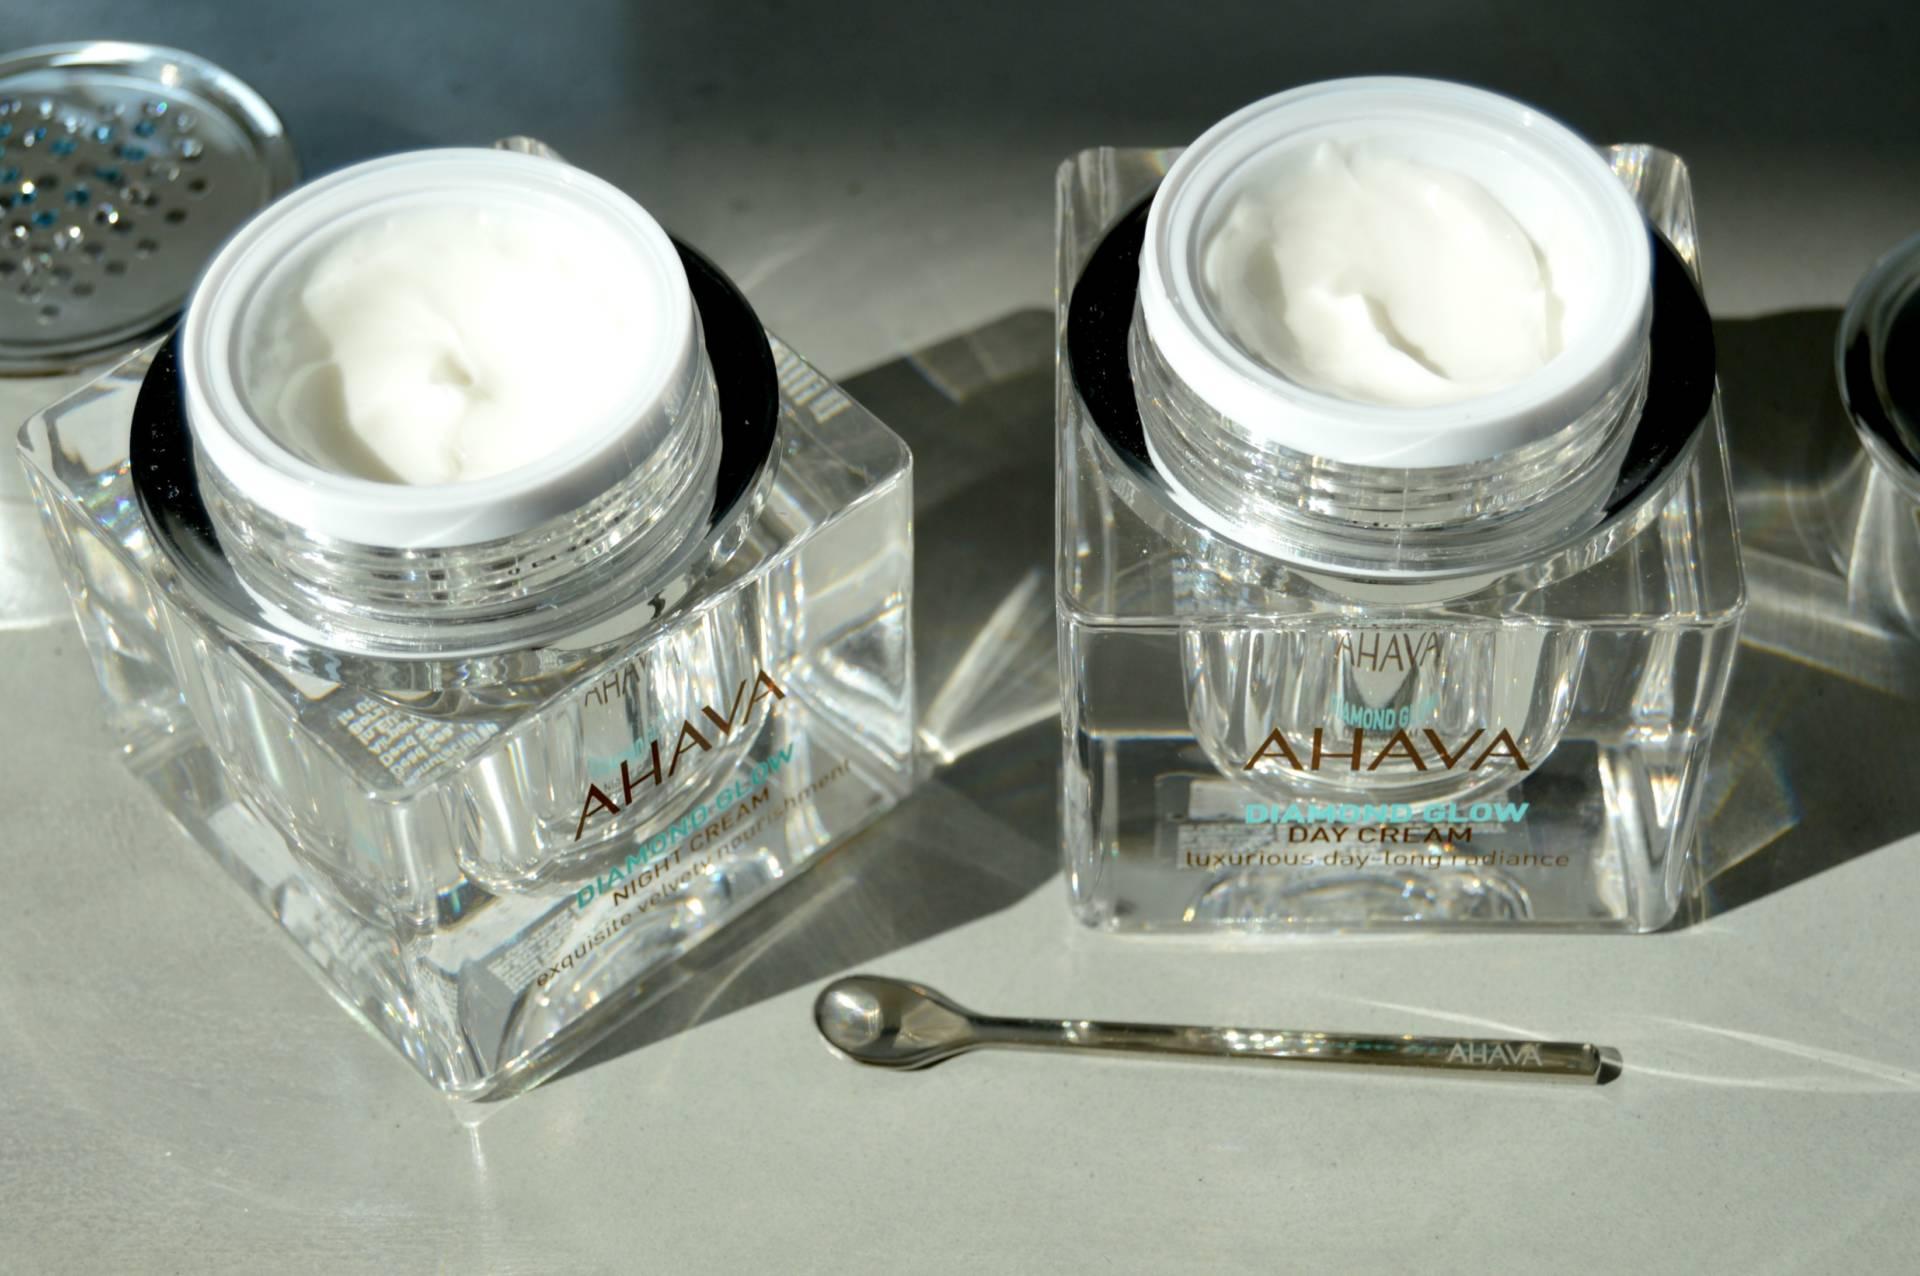 ahava-inhautepursuit-diamond-glow-face-cream-day-night-review